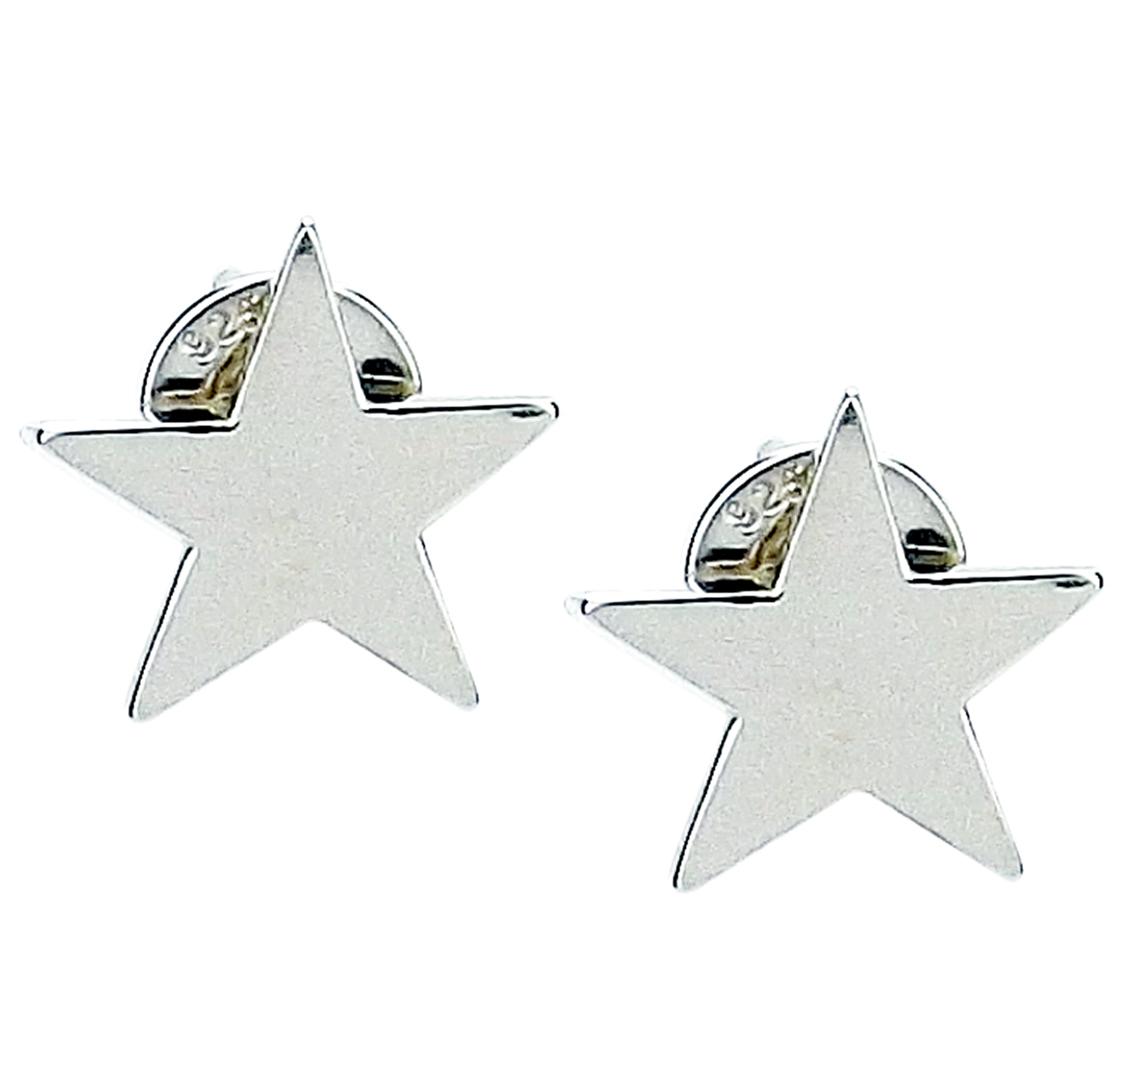 Sterling Silver Star Shaped Stud Earrings